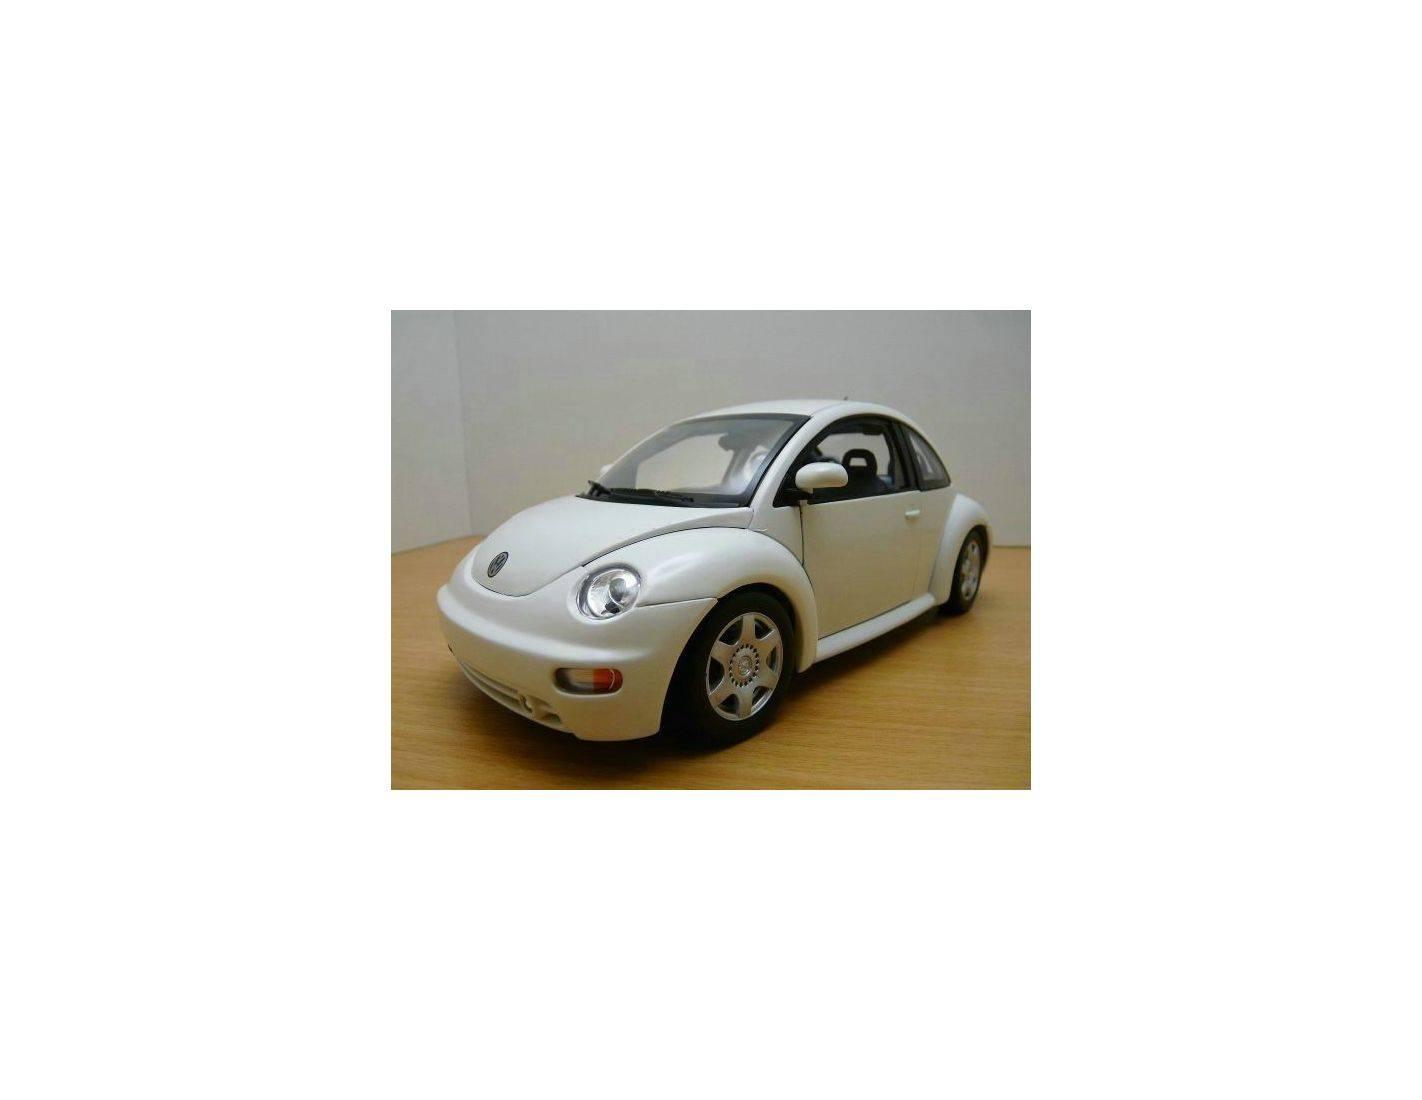 Auto Art / Gateway 01035 VW NEW BEETLE COUPE'98 BIANCO 1/18 Modellino